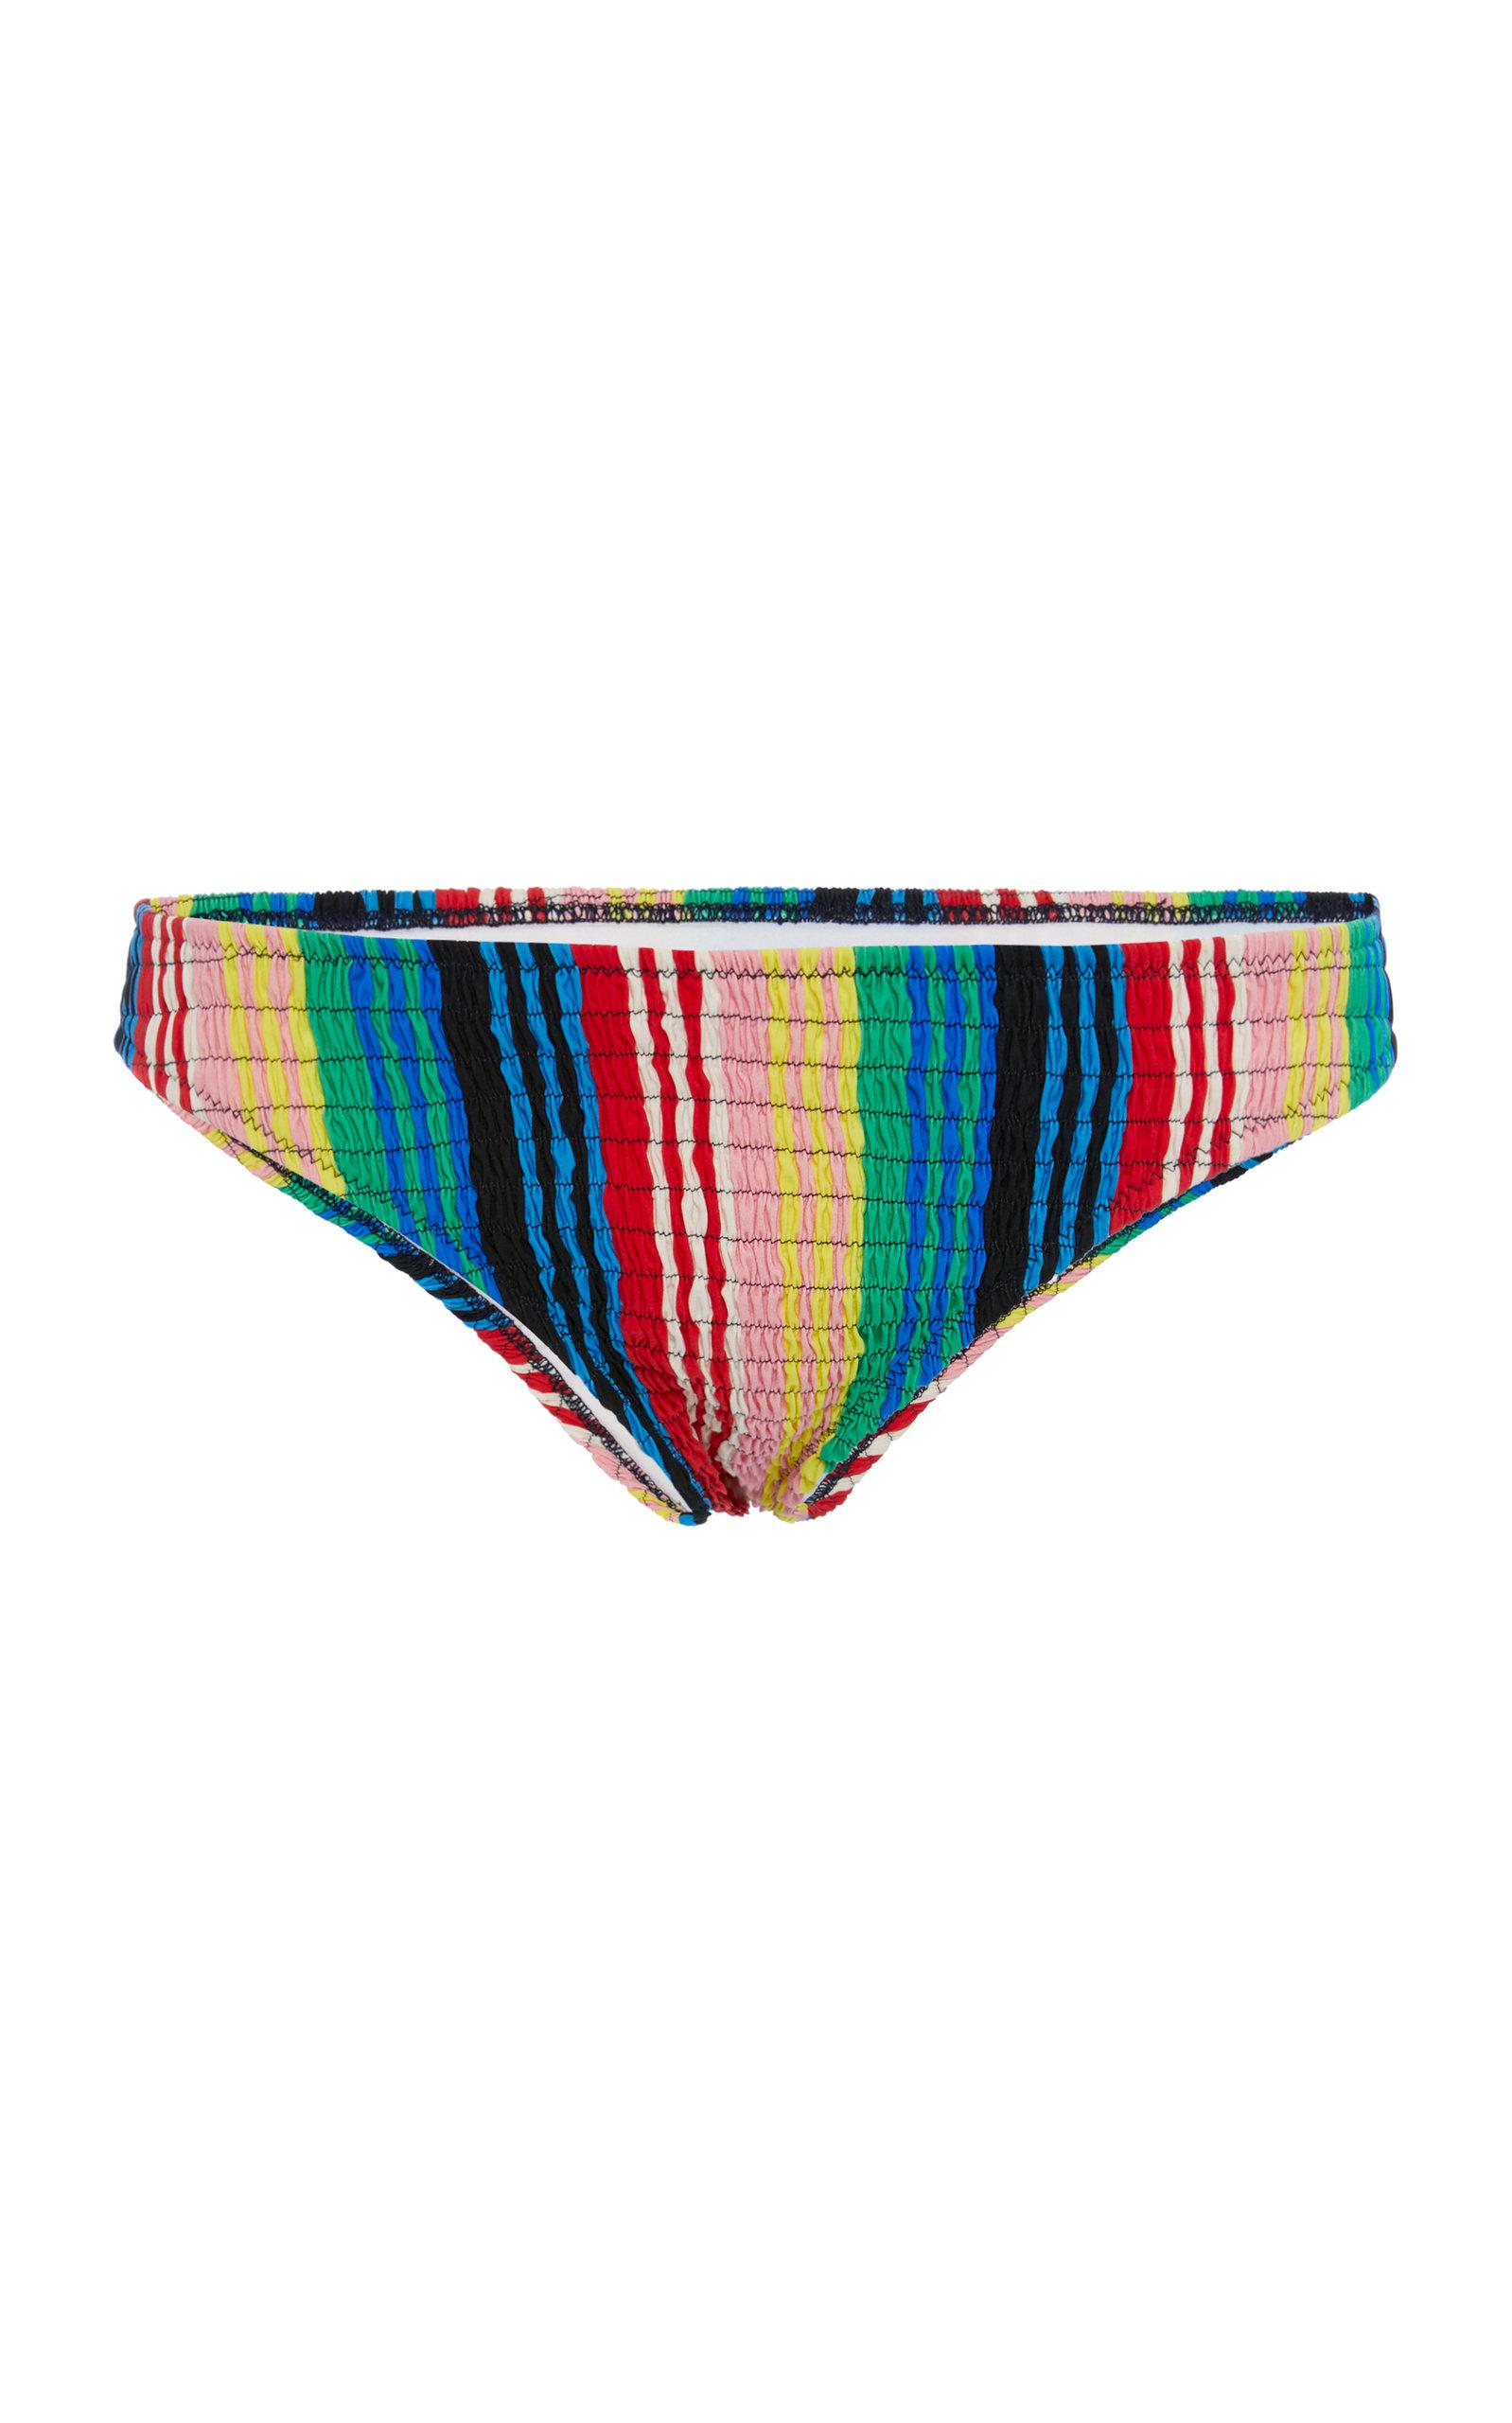 Diane von furstenberg bikini bottom-6271